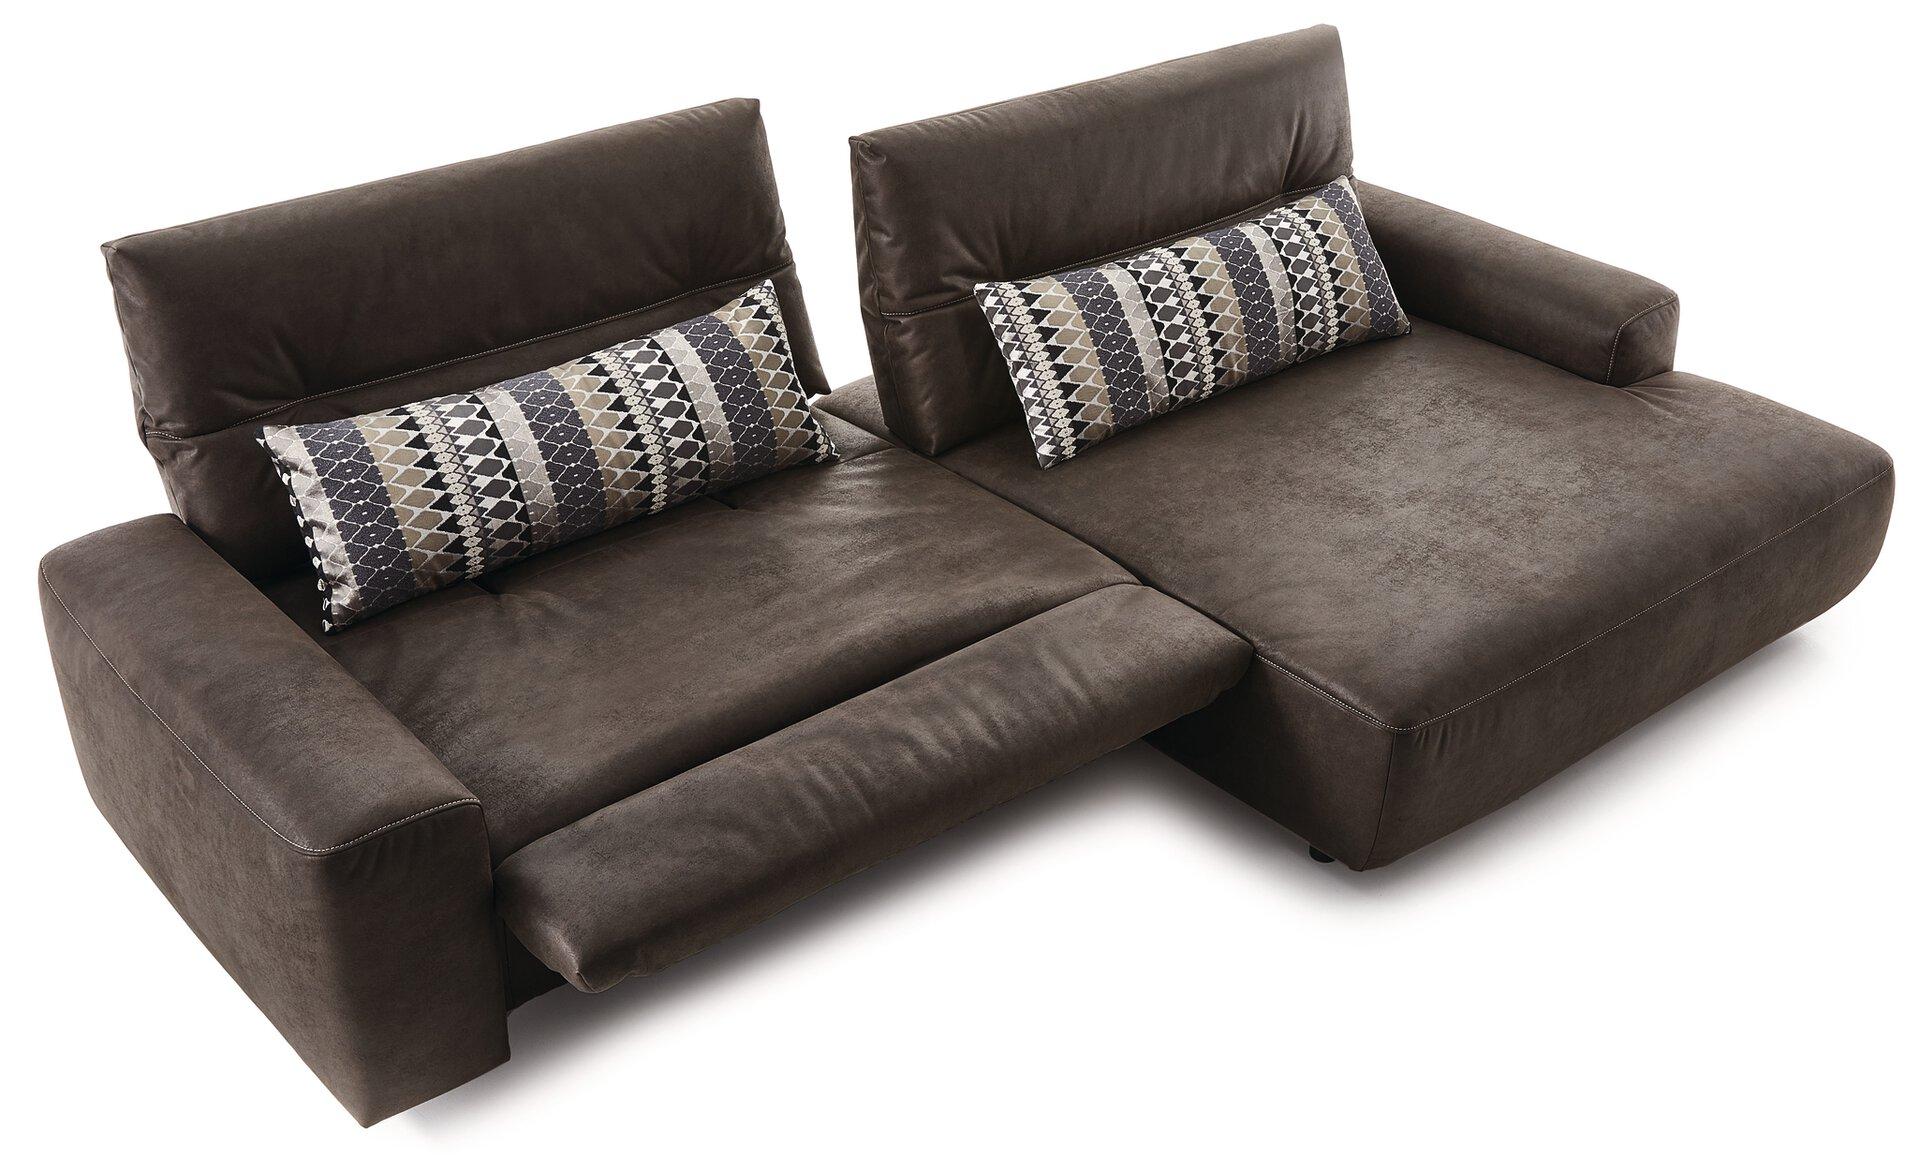 Ecksofa COLAMBO Koinor Textil 155 x 94 x 149 cm